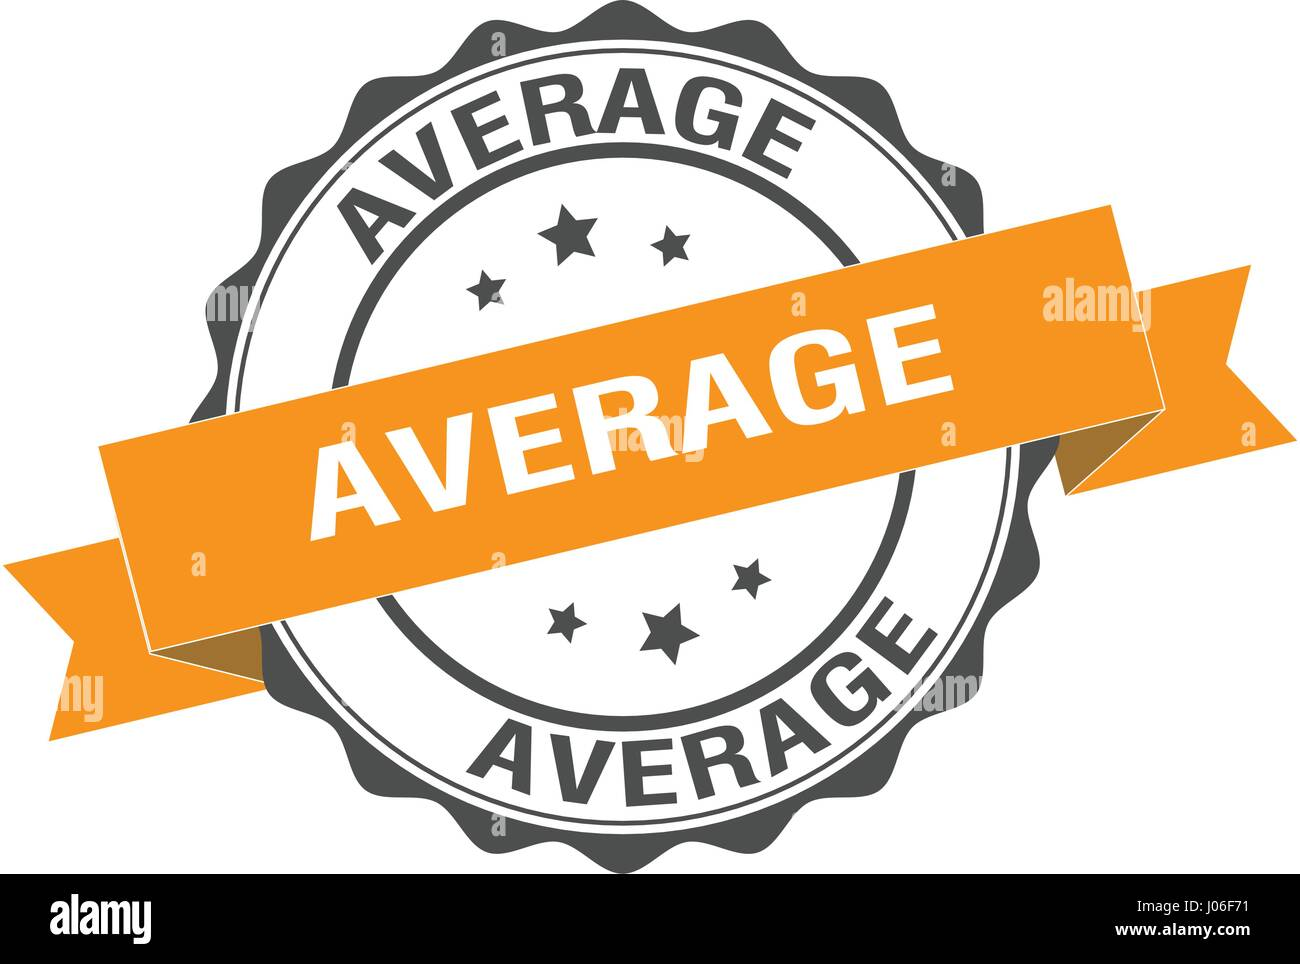 Average stamp illustration - Stock Image